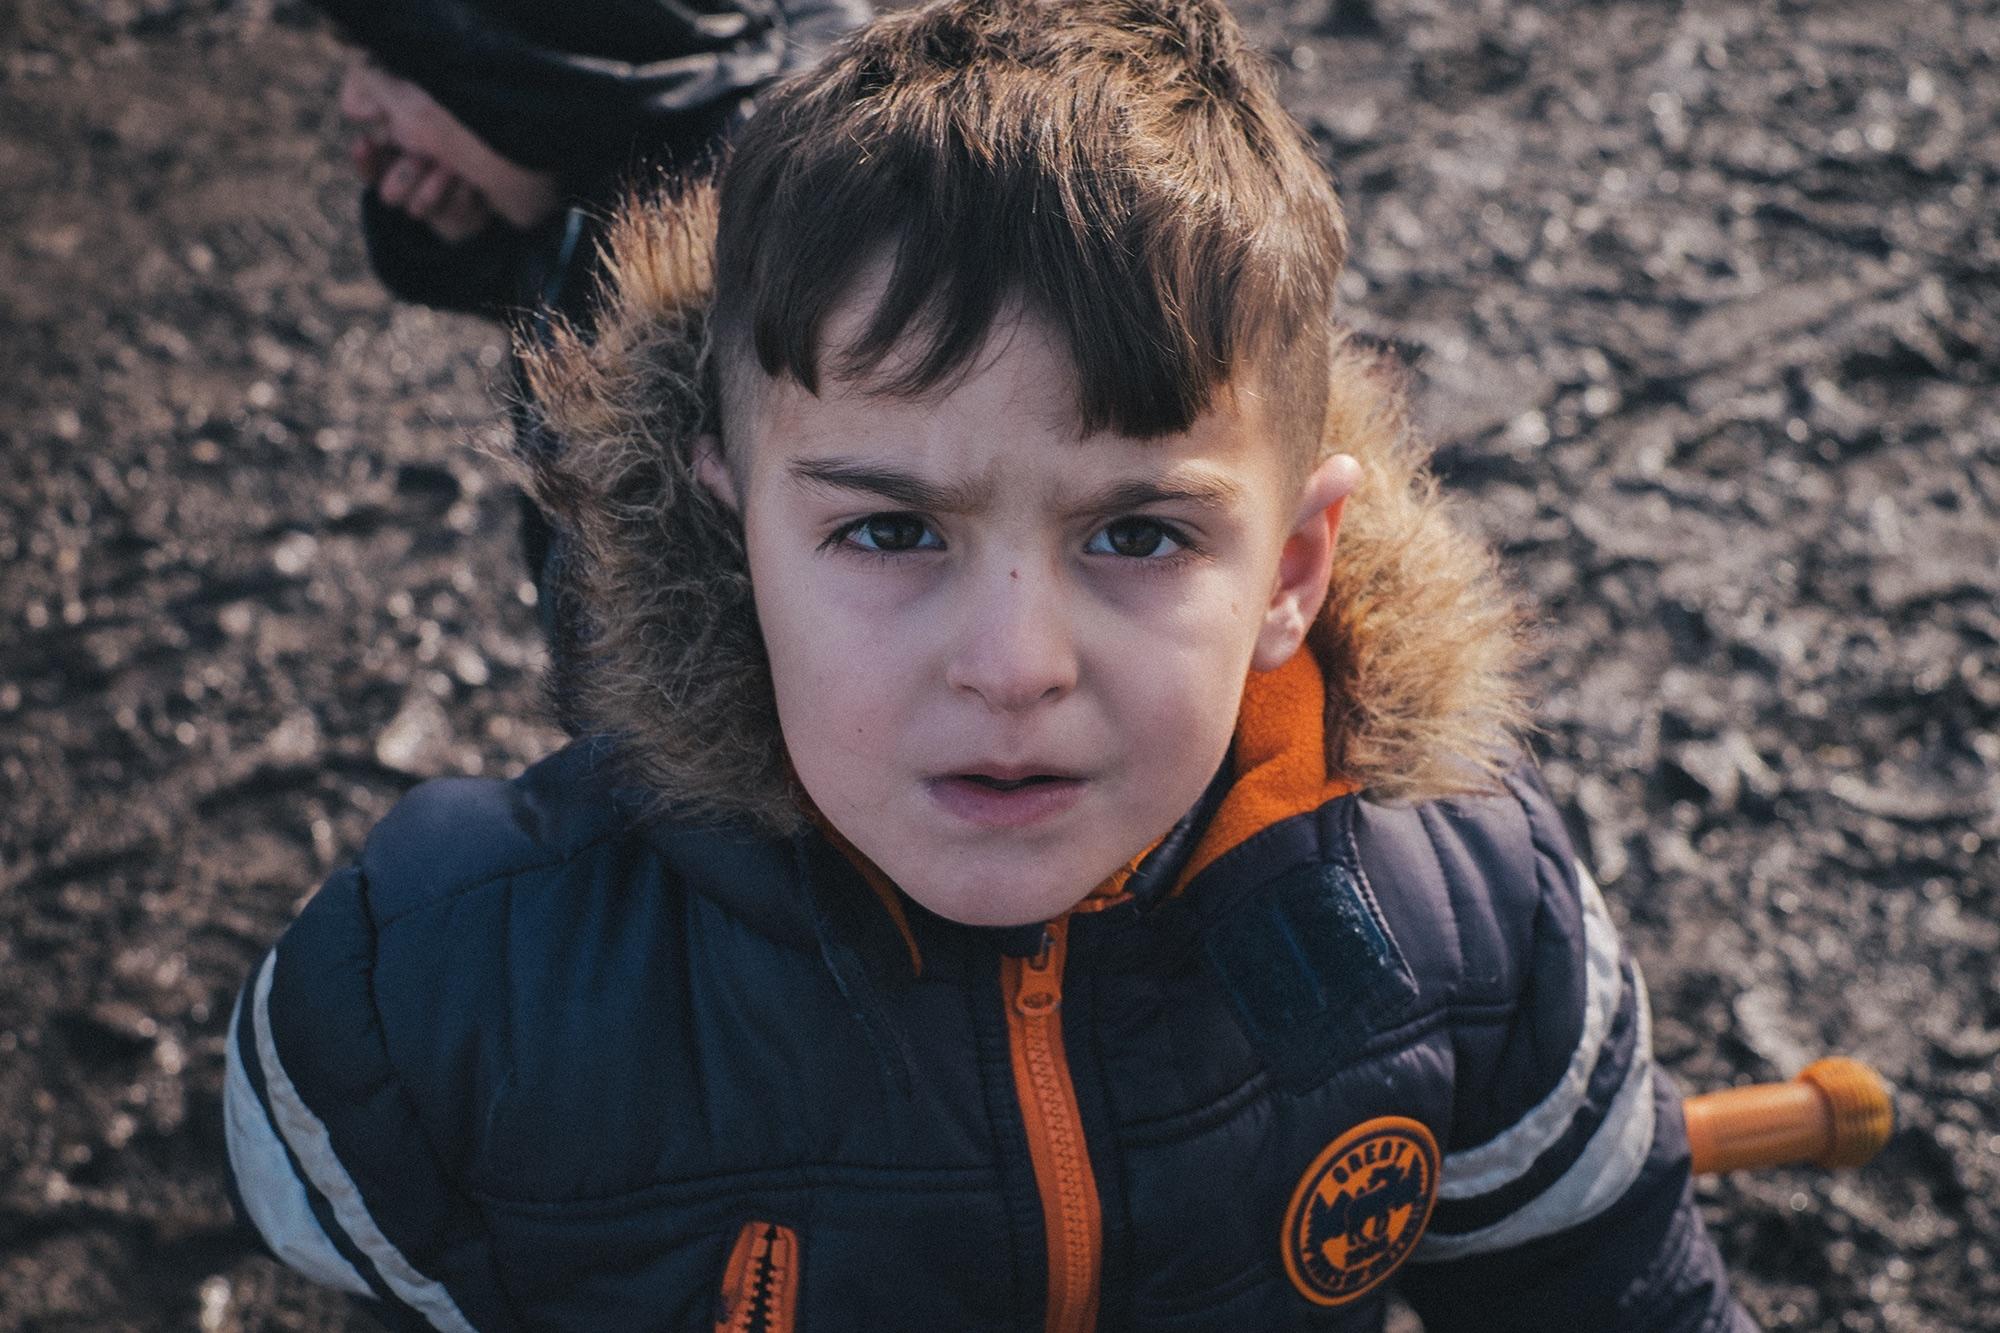 Awara, 5 years, Afghanistan